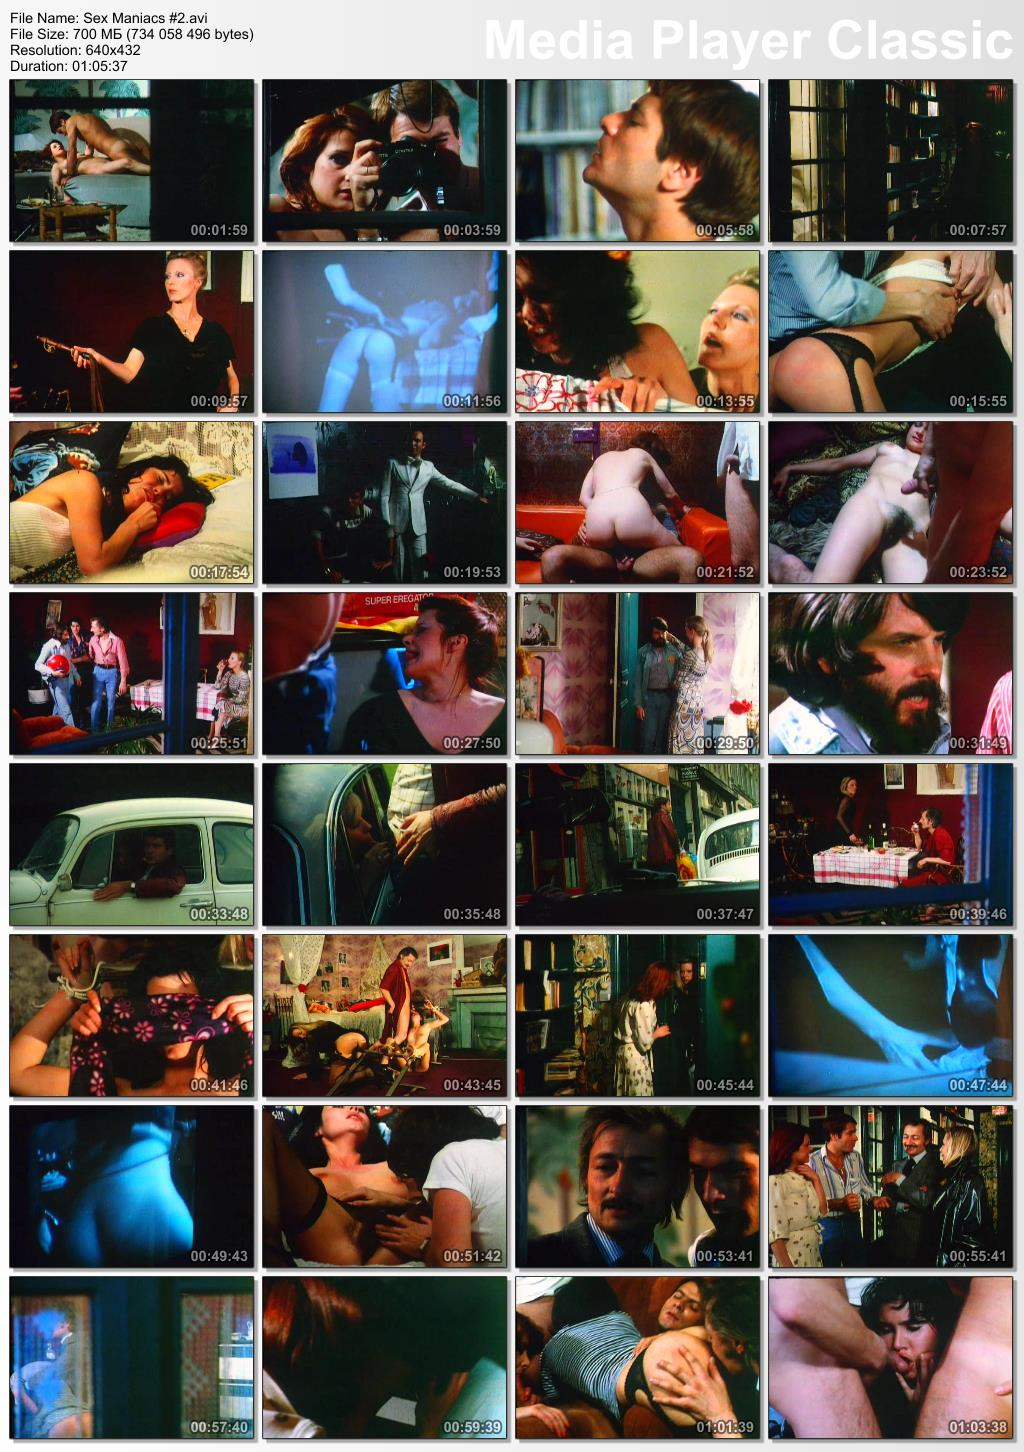 Maniac sex movies erotic pic